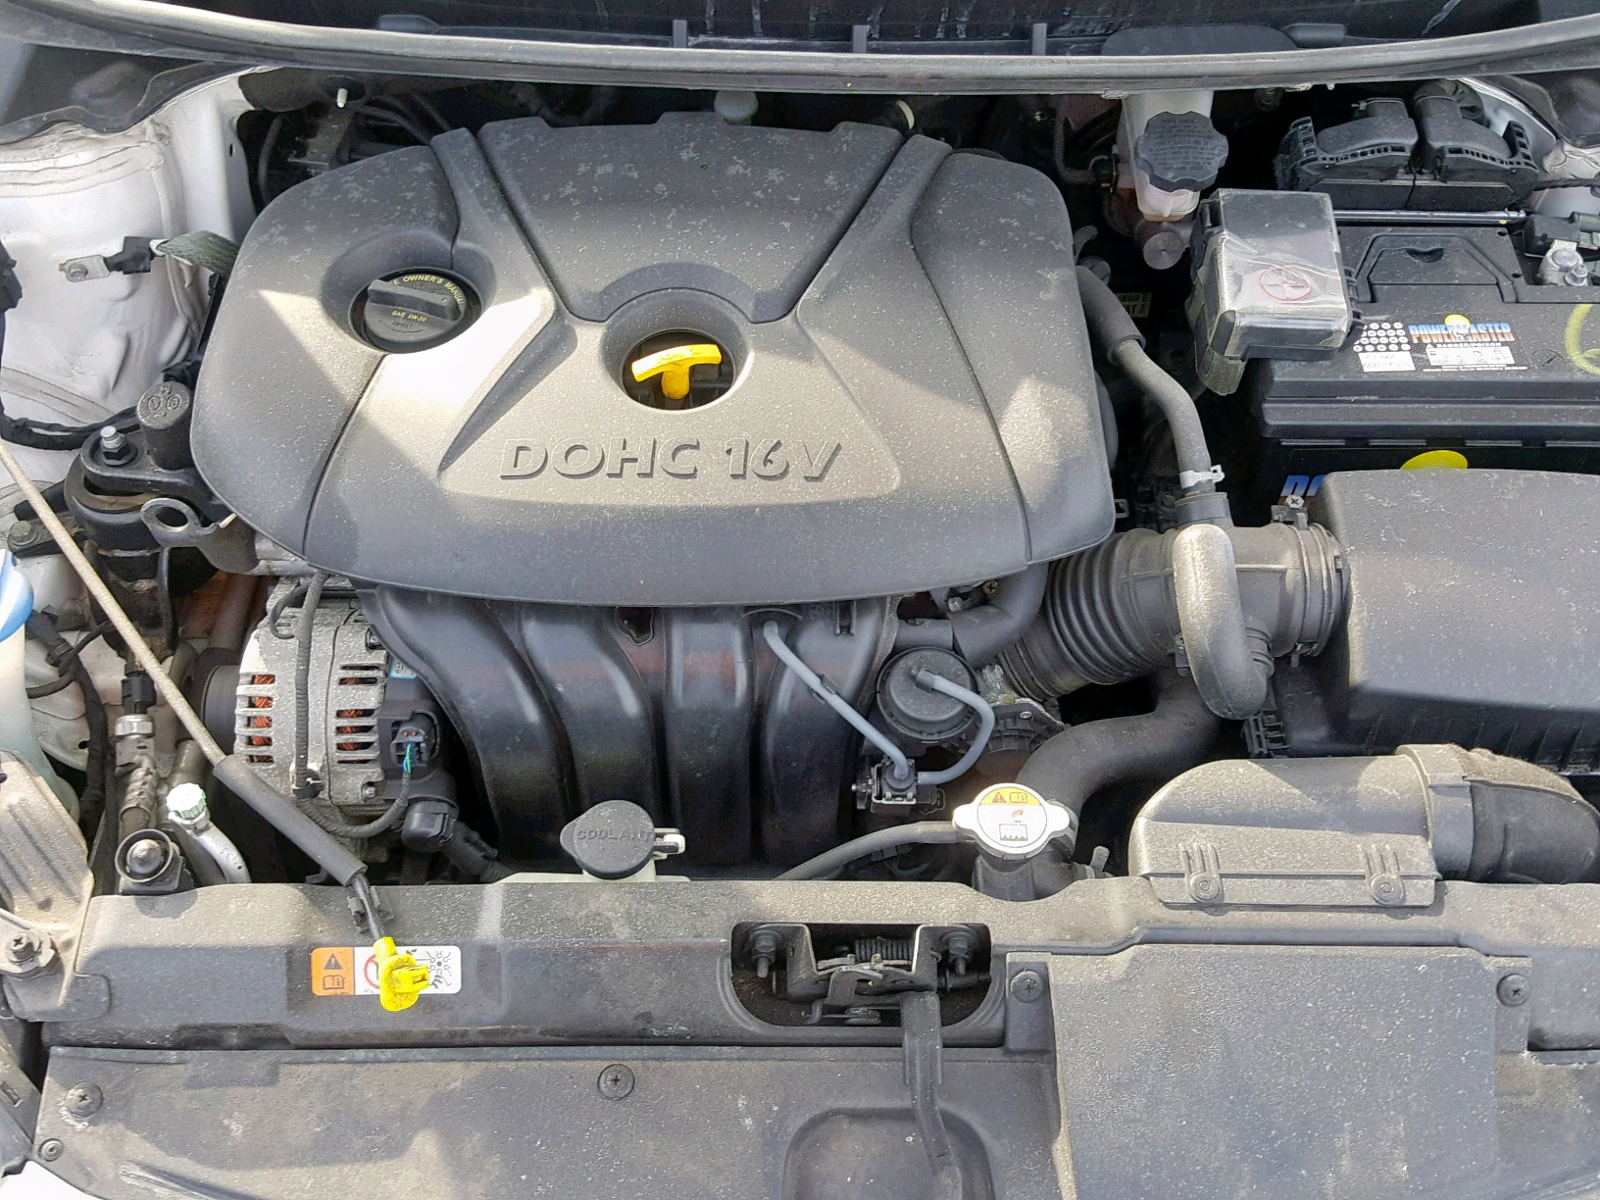 2016 Hyundai Elantra Se 1.8L inside view